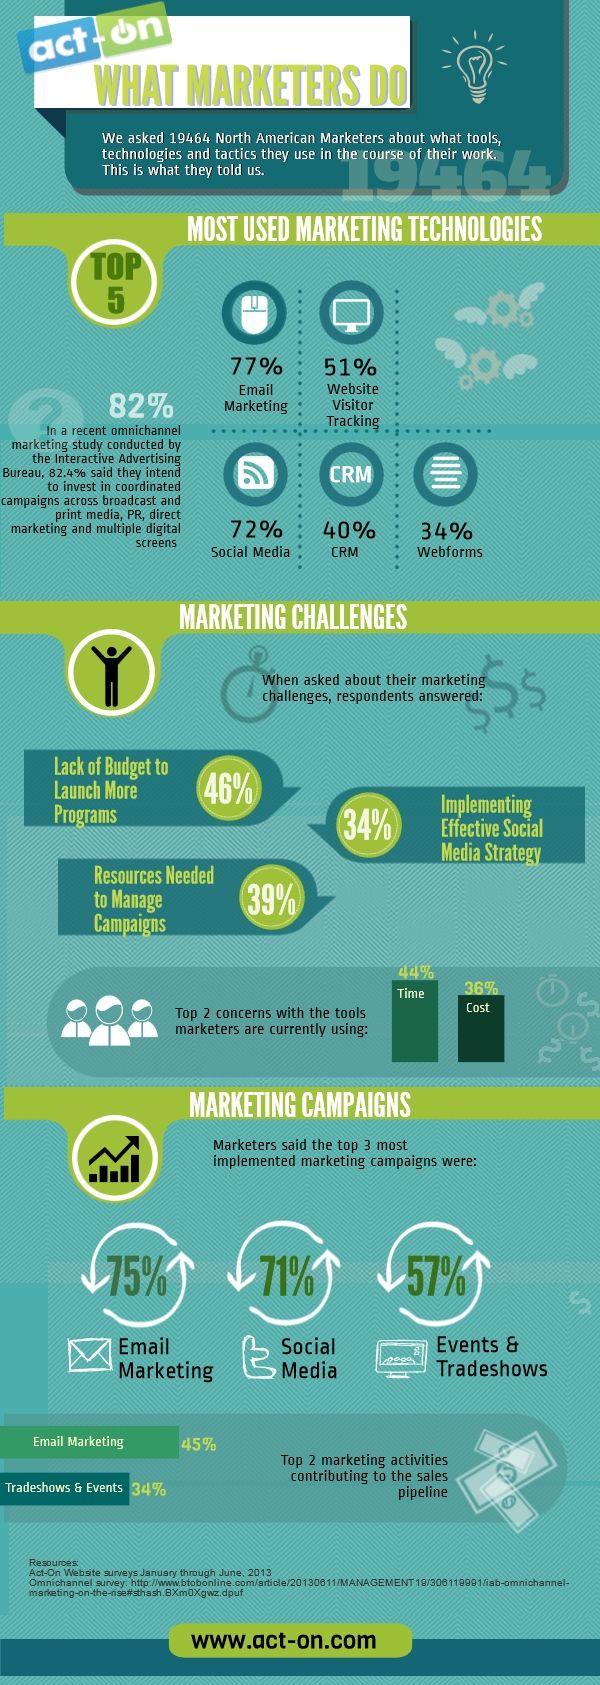 [Infographic] What Marketers Do #emailmarketing #socialmediamarketing